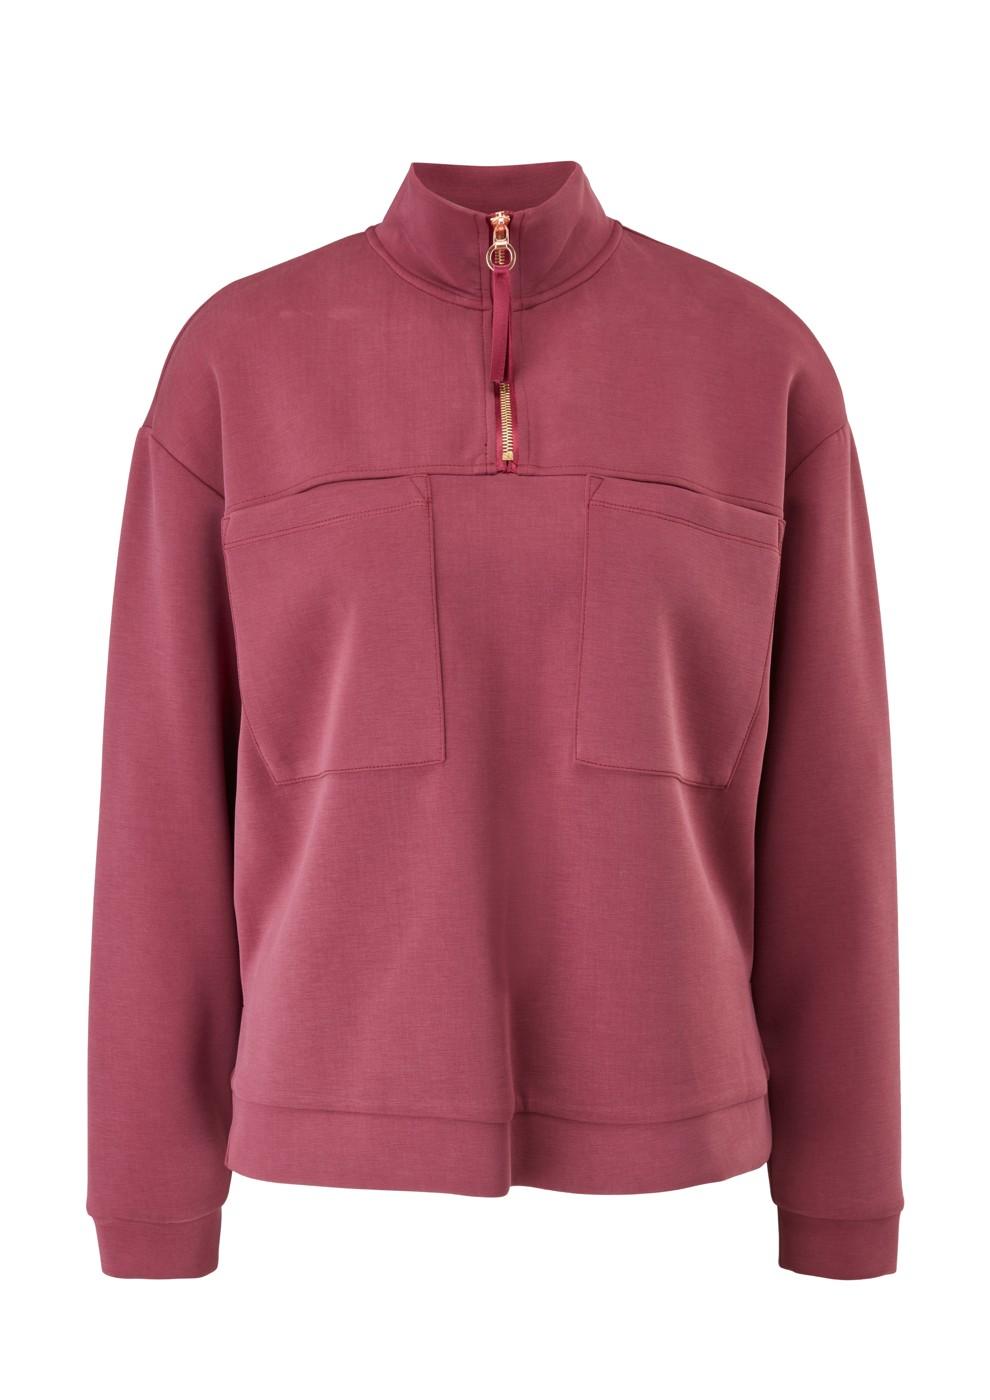 120 Sweatshirt langarm - Damen